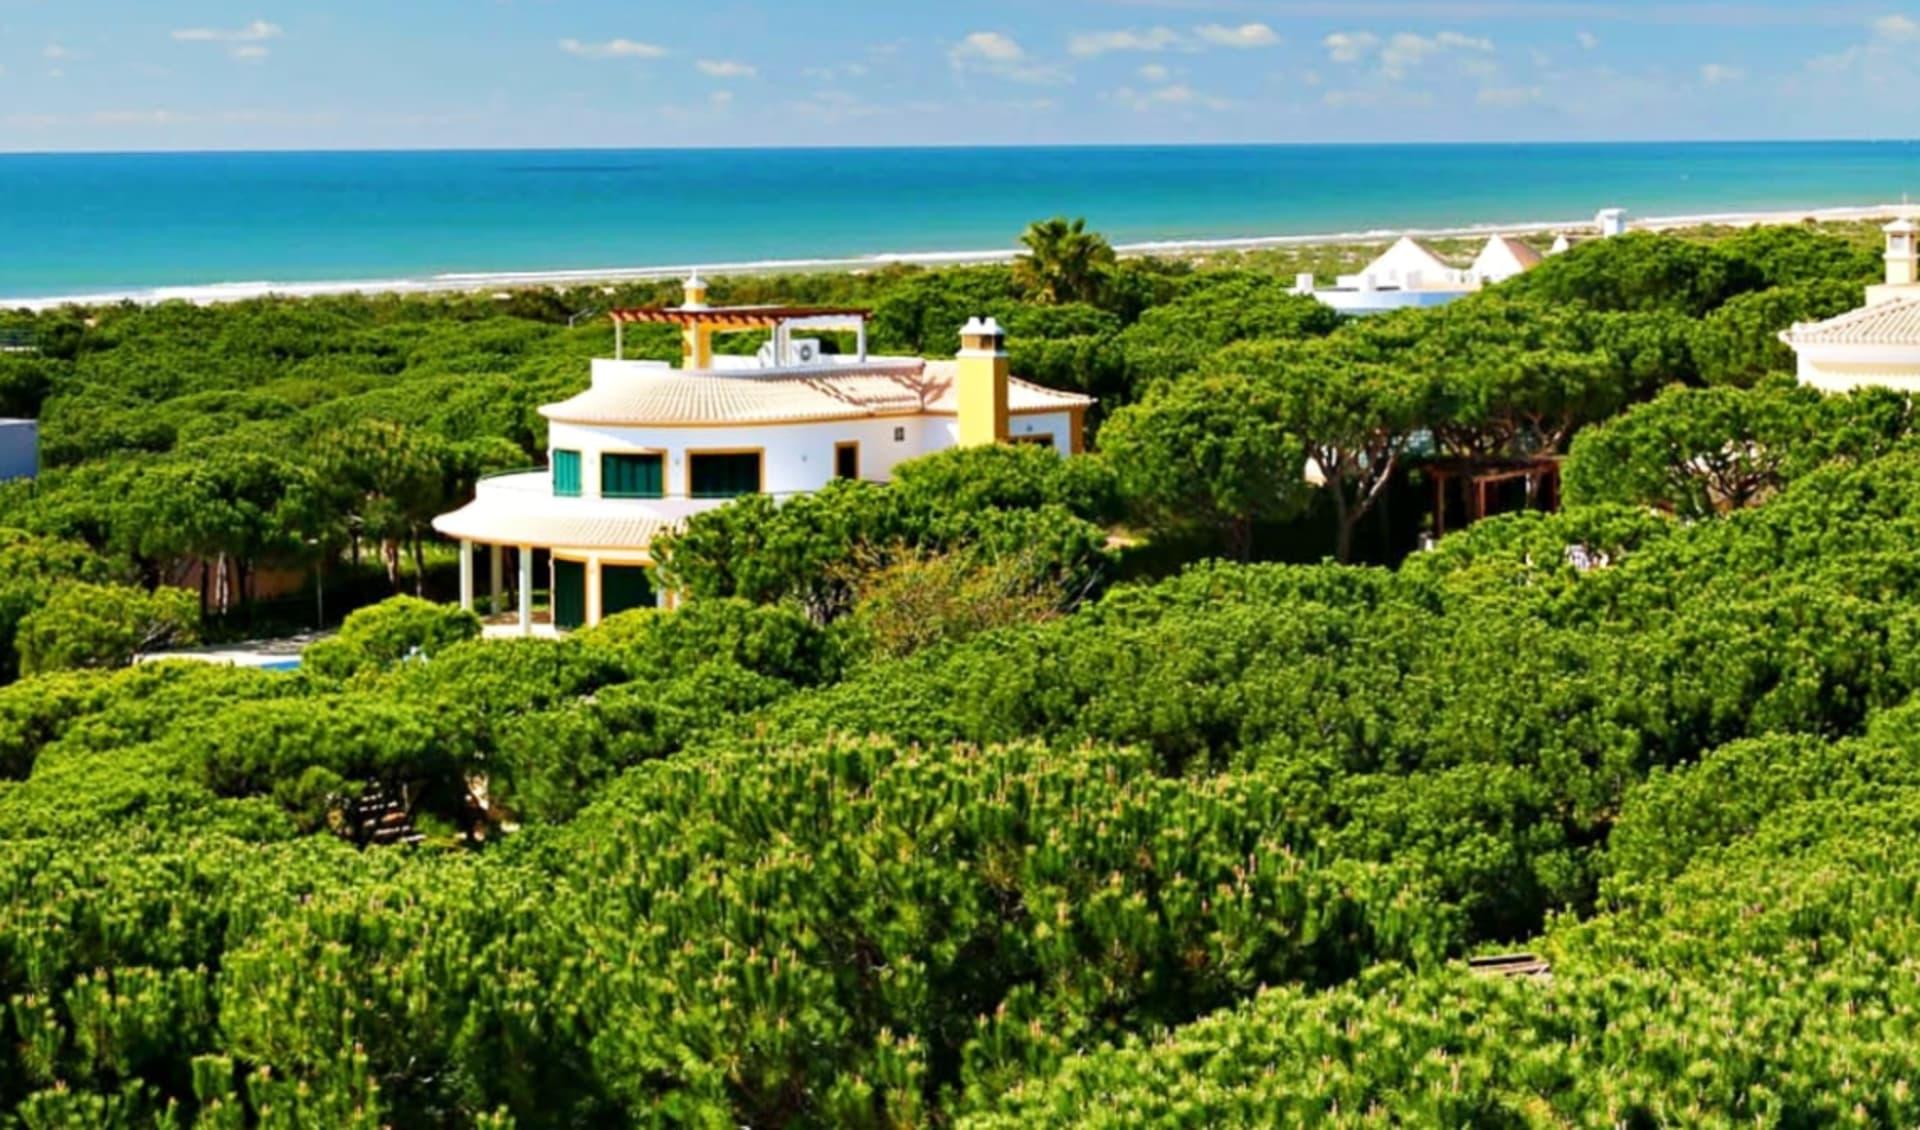 Praia Verde Boutique Hotel in Algarve: Hotel_view